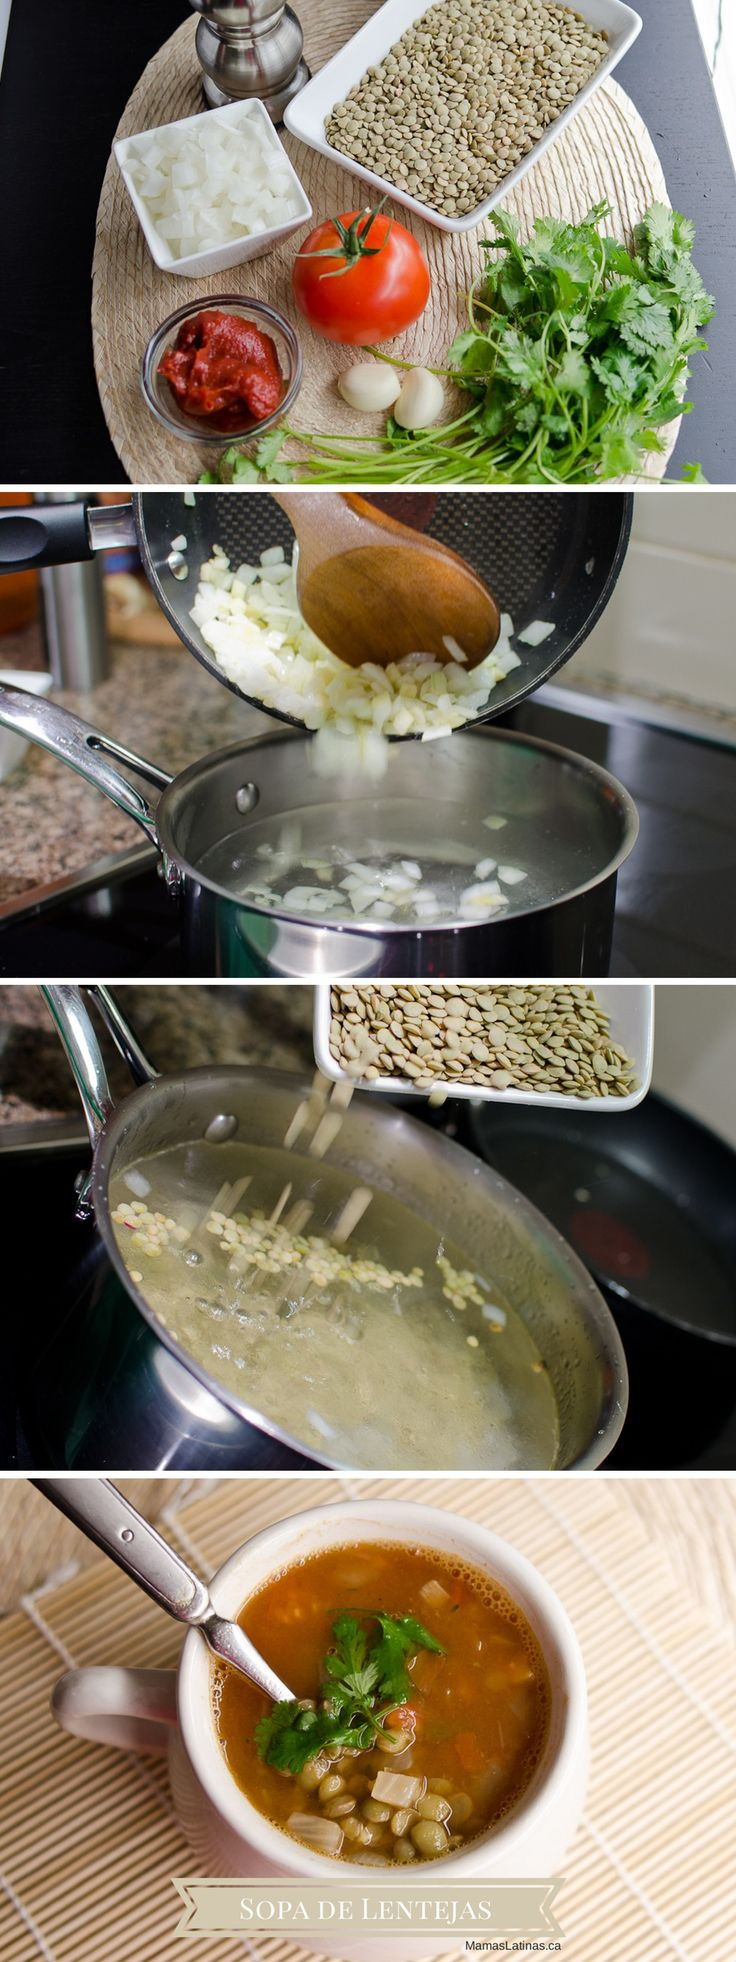 Receta Sopa De Lentejas #mamaslatinas